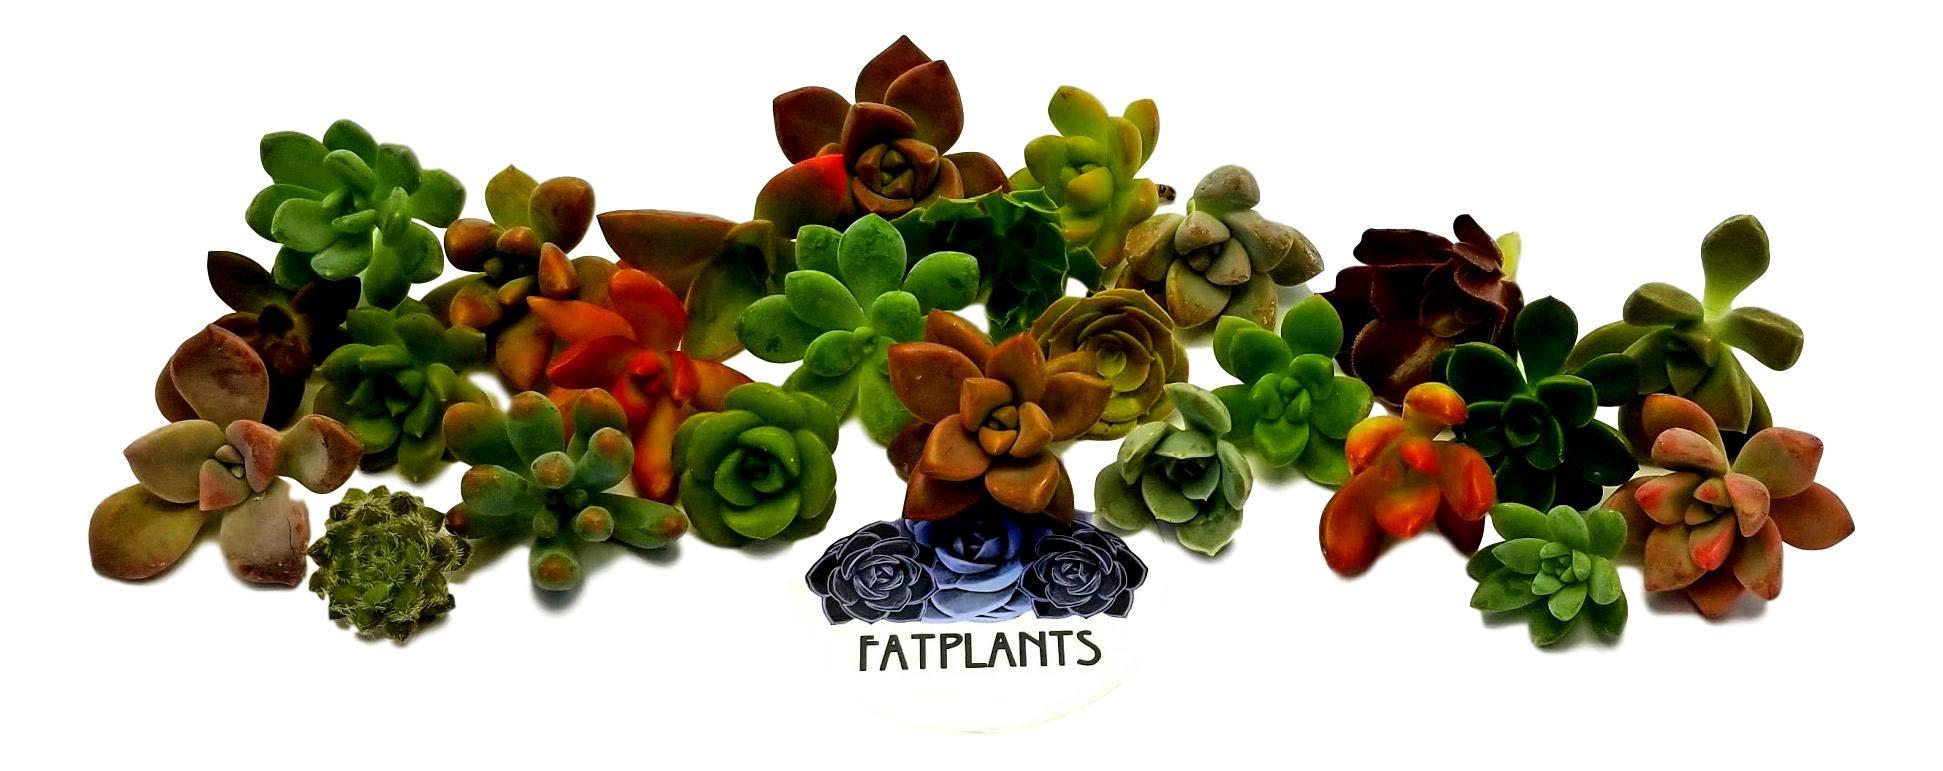 Fat Plants San Diego Miniature Rosette Succulent Cuttings (25) by Fat Plants San Diego